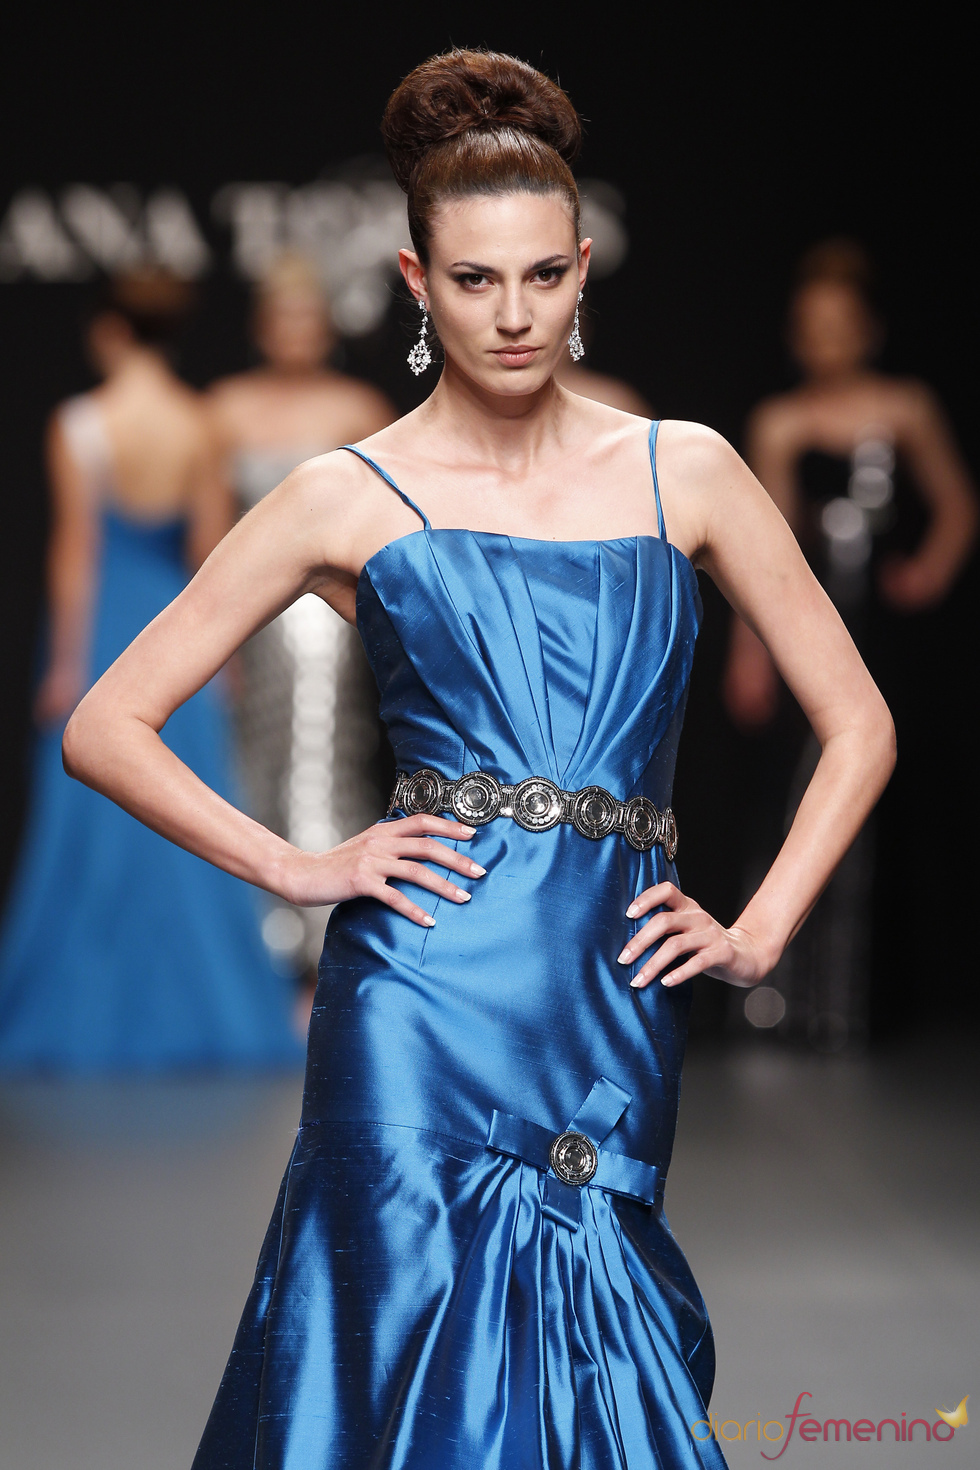 Vestido de fiesta azul de Ana Torres